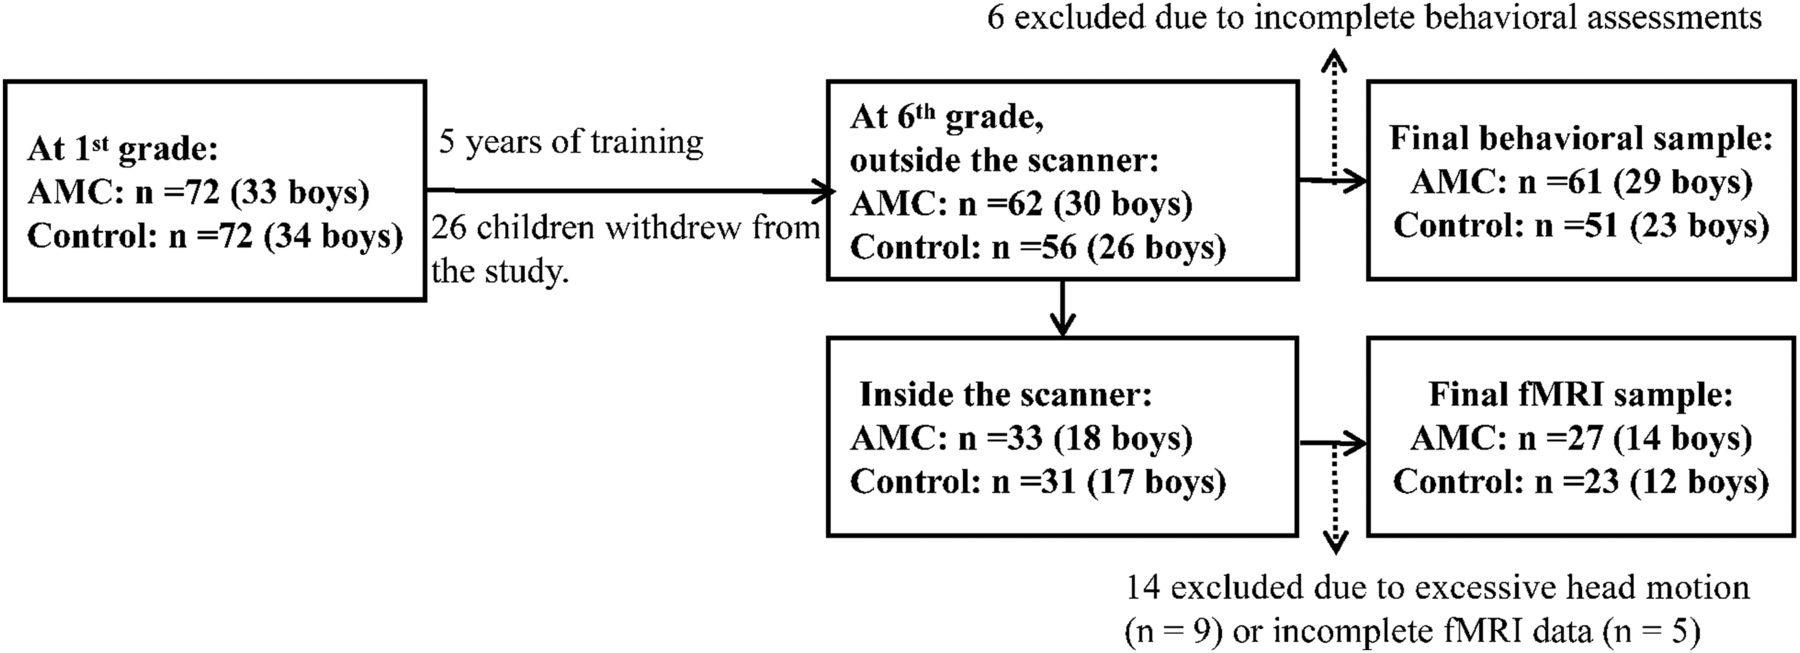 Training on Abacus-Based Mental Calculation Enhances